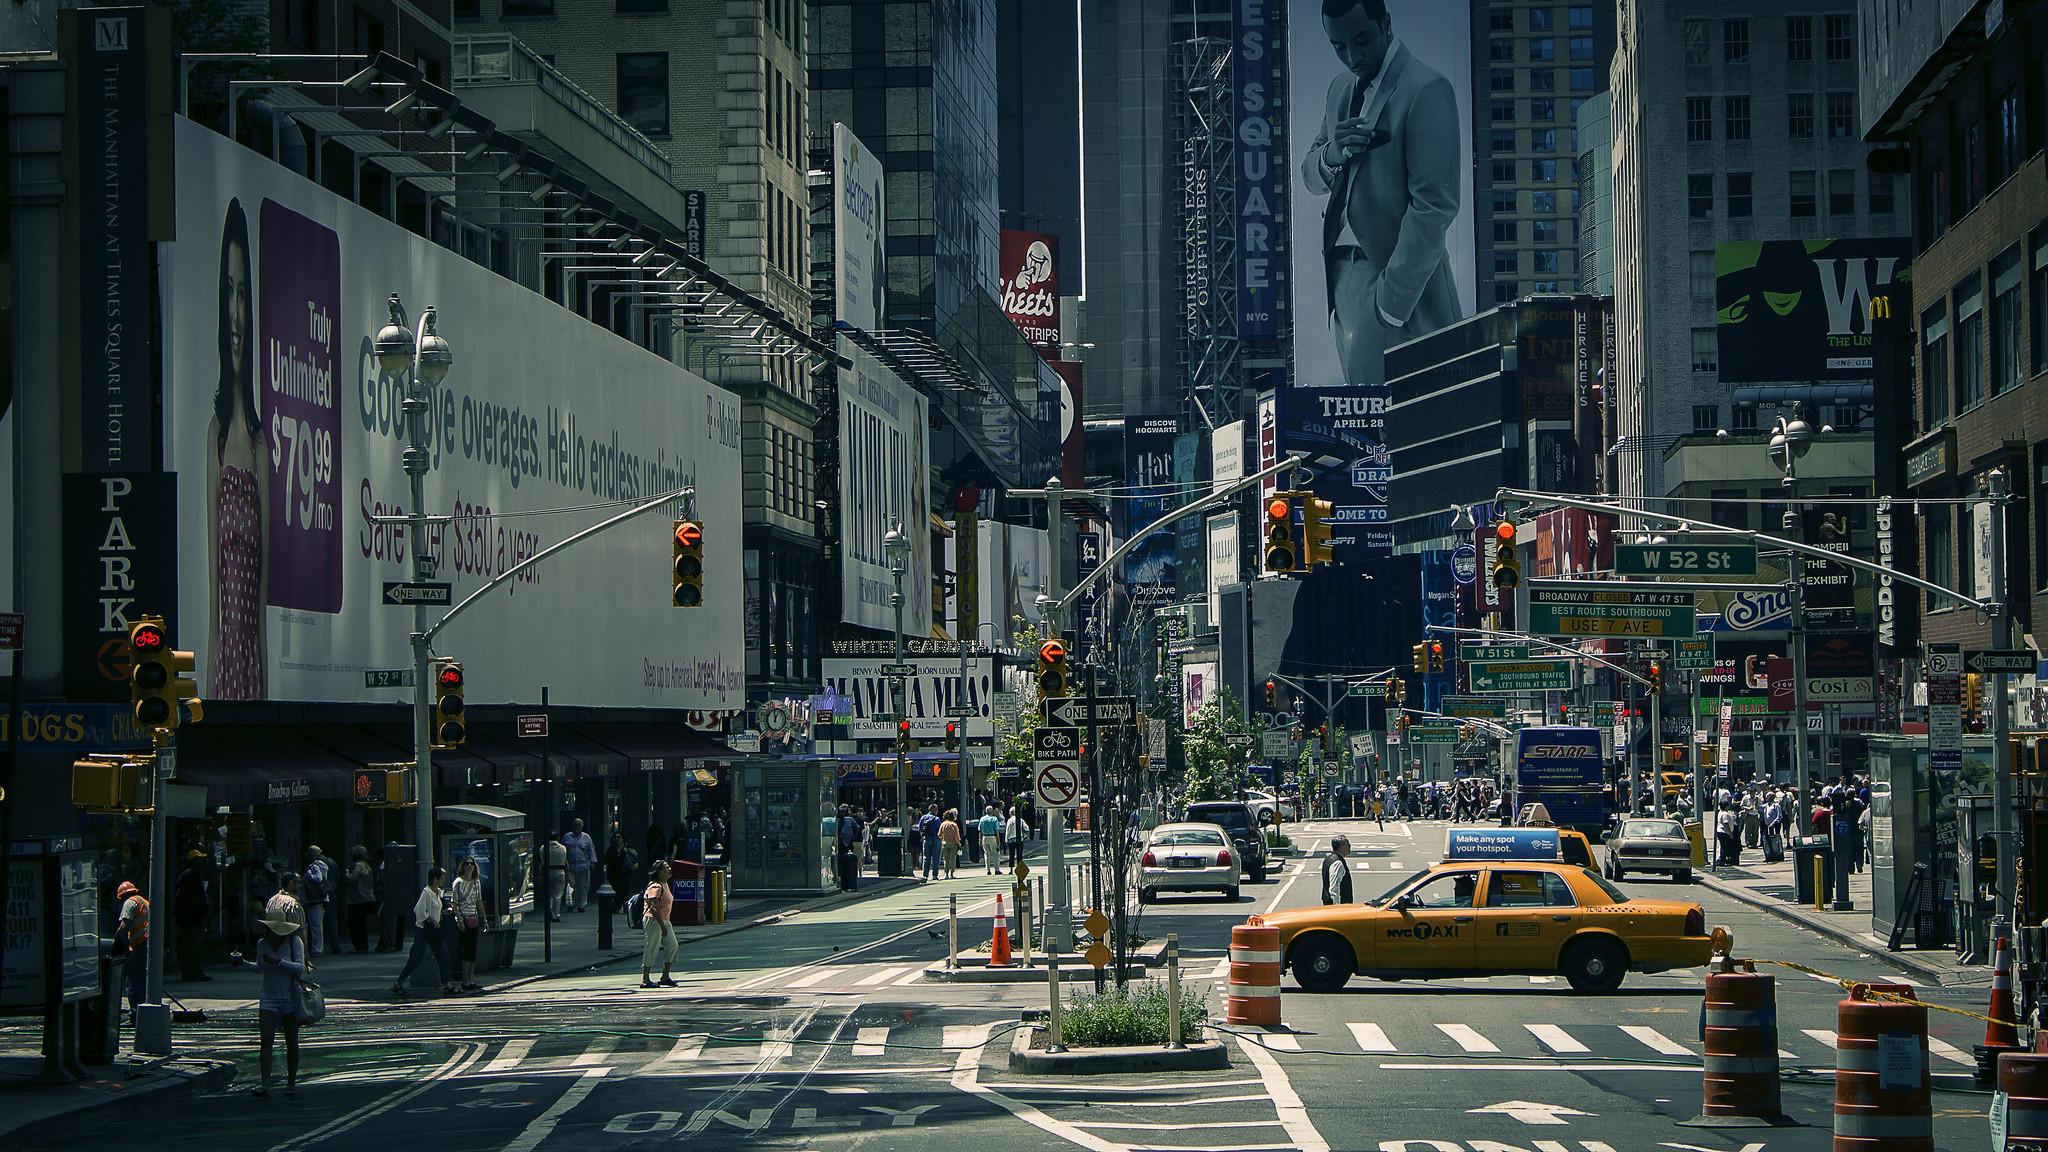 2048x1152 New York City Street World HD Desktop Wallpaper